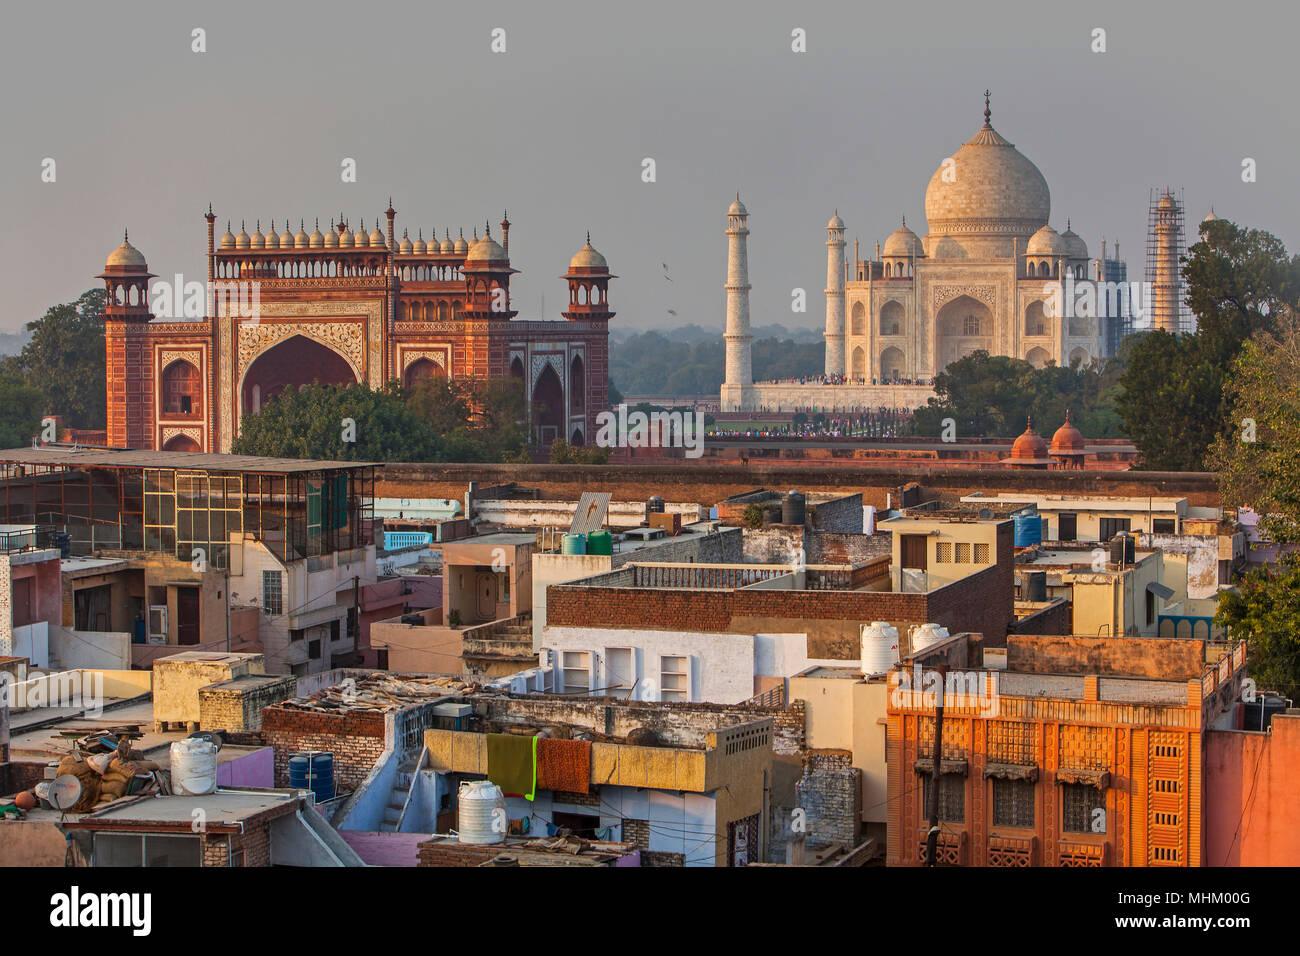 Taj Mahal and roofs of the city, Agra, India - Stock Image